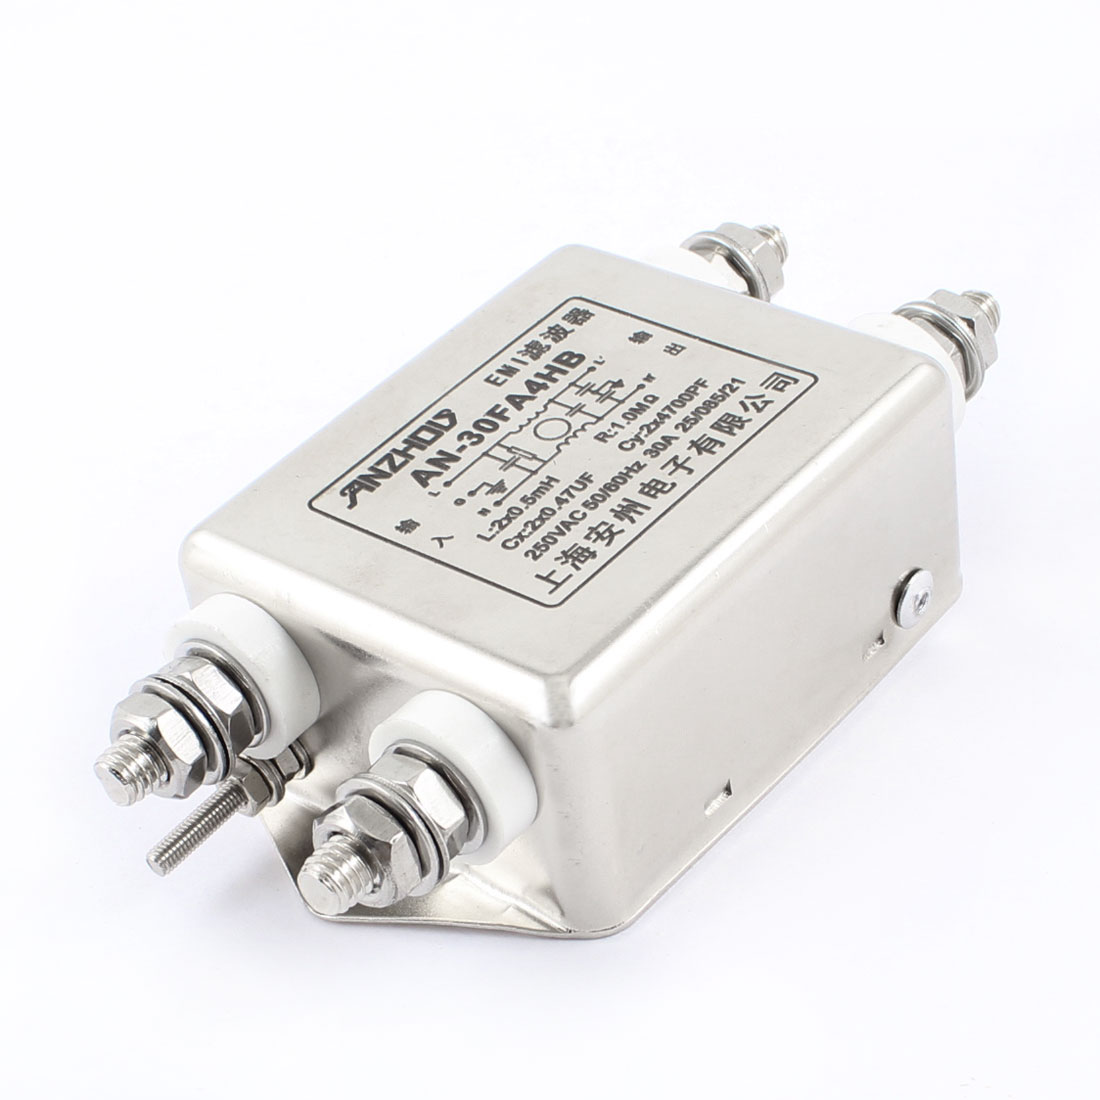 AN-30FA4HB Silver Tone Case 30A AC 250V 50/60Hz Power Line EMI Filter